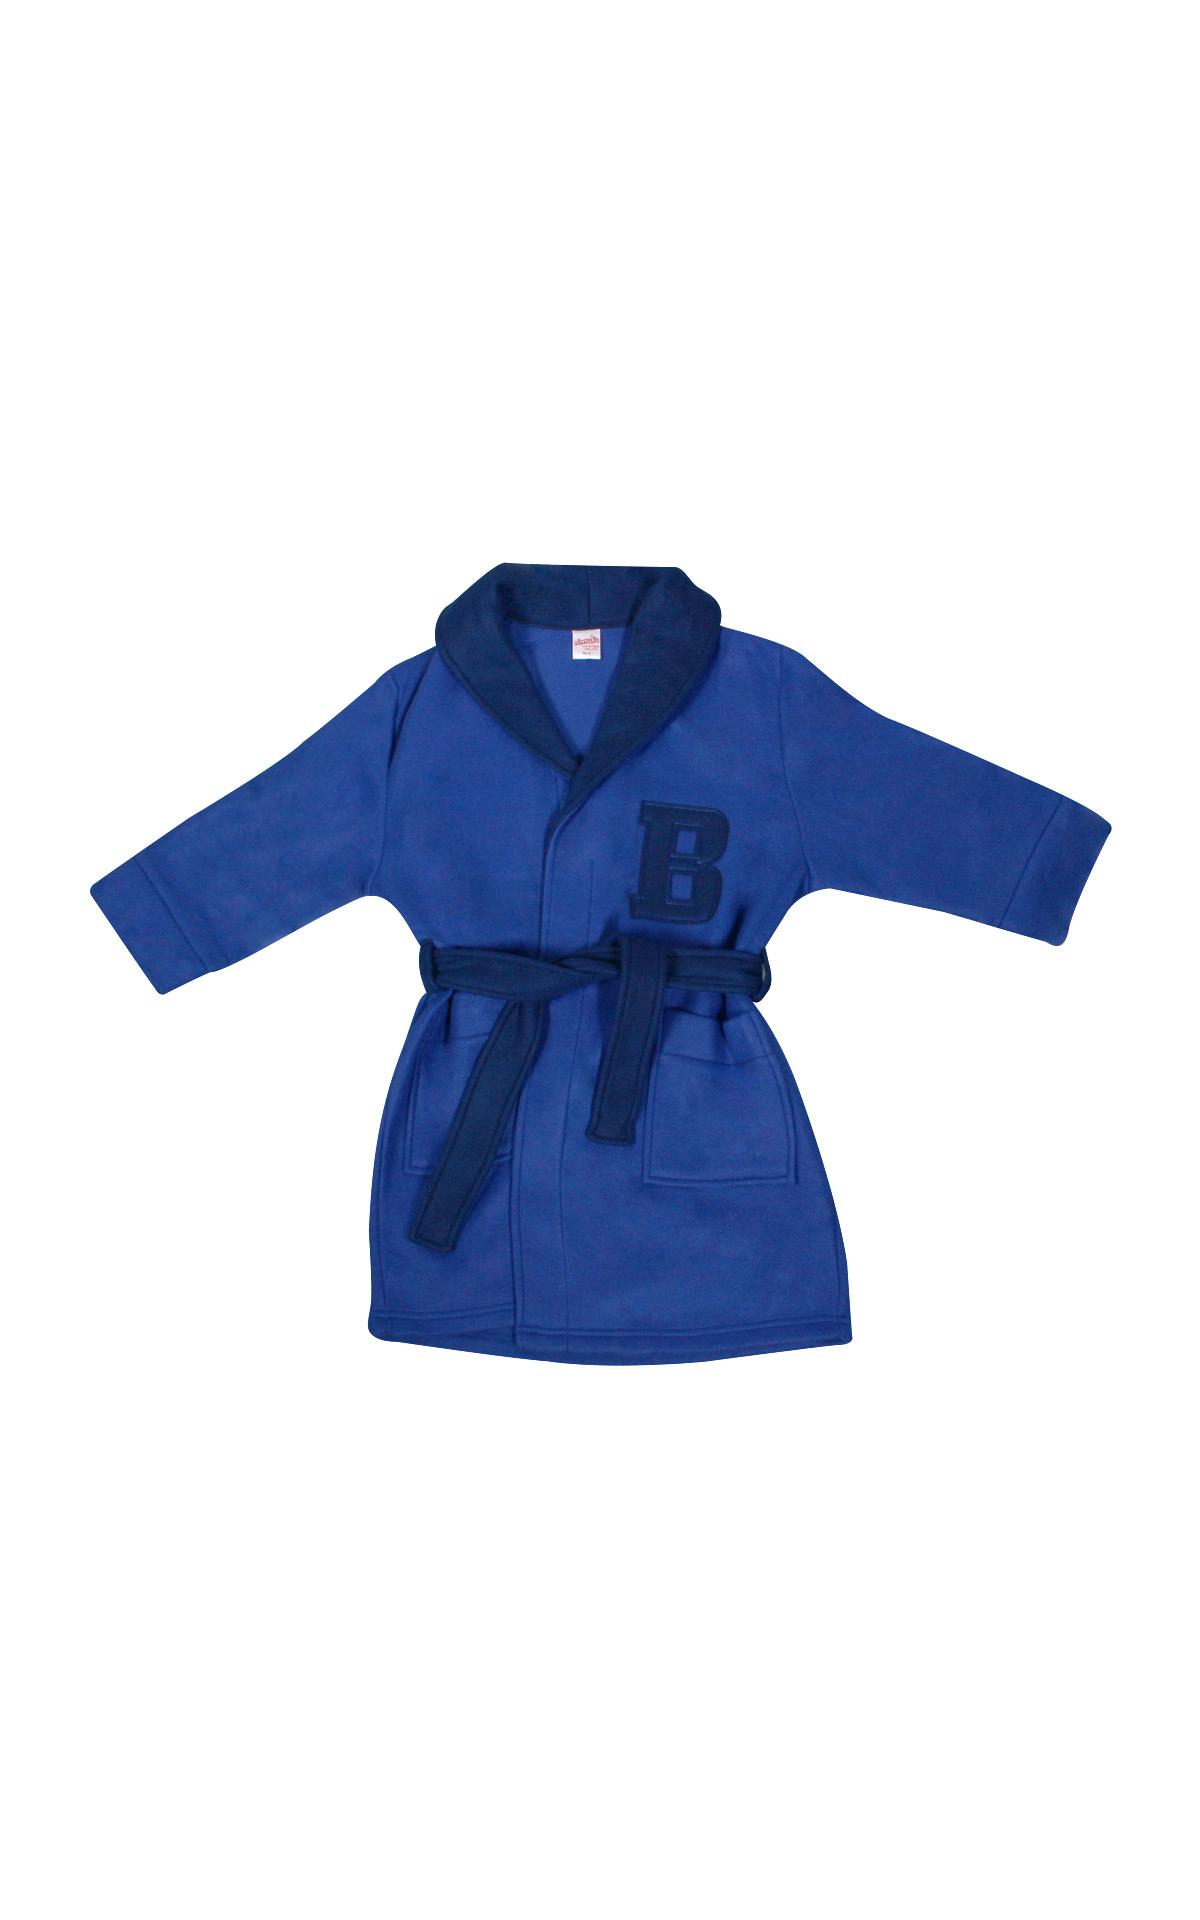 7155d39b4a3 Παιδί Αγόρι Ρόμπα / Μπουρνούζι Ρόμπα Παιδική Αγόρι Fleece Uni W15